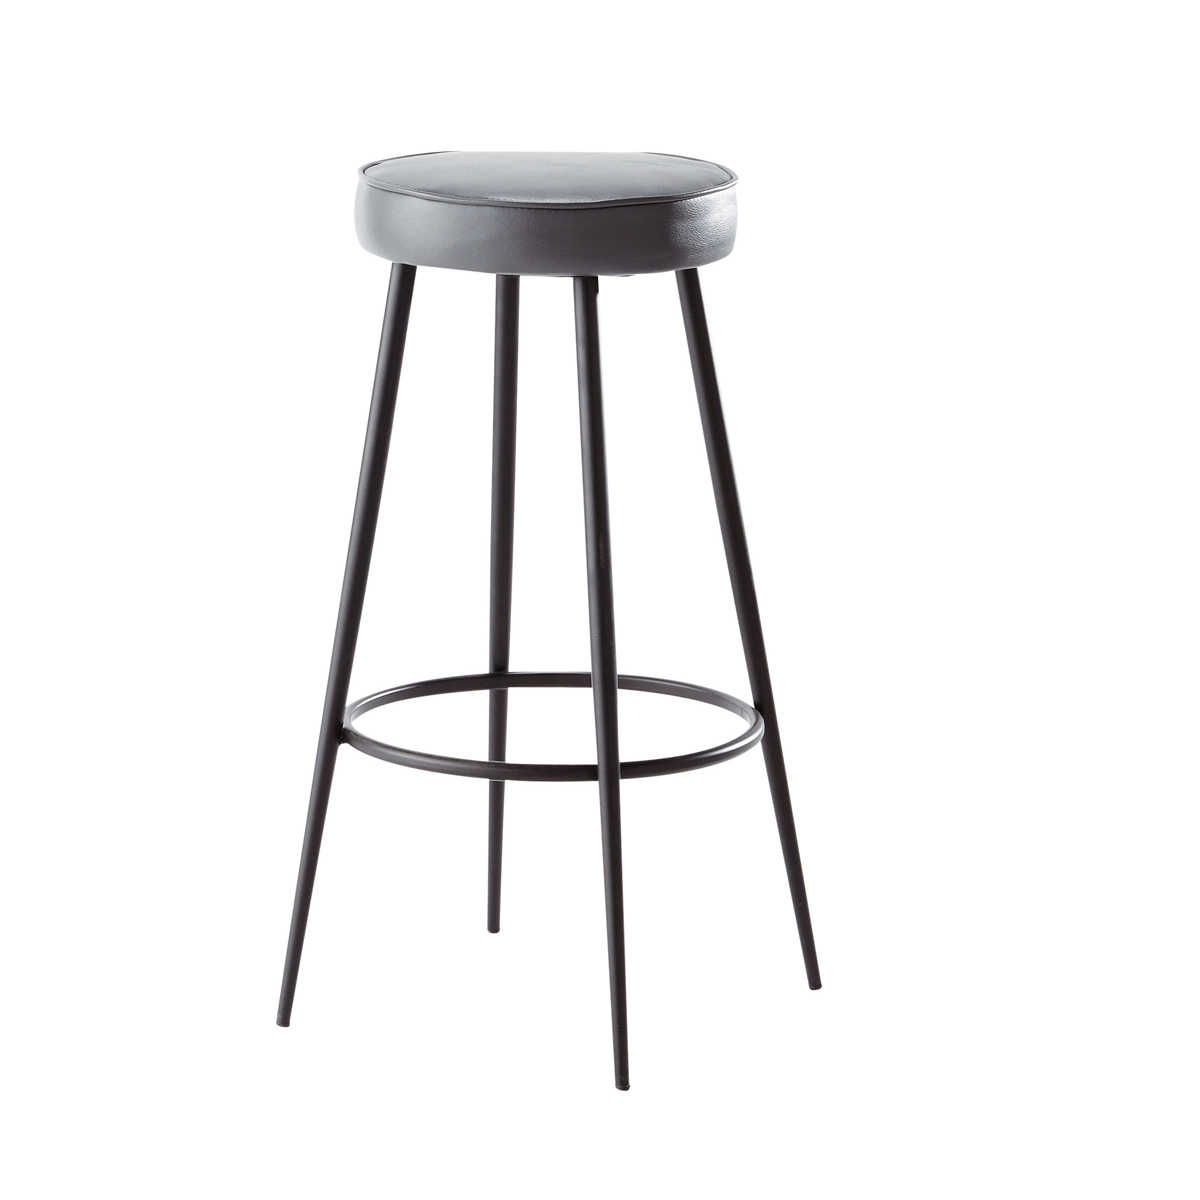 charcoal grey bar stool caps k i t c h e n chaise bar. Black Bedroom Furniture Sets. Home Design Ideas